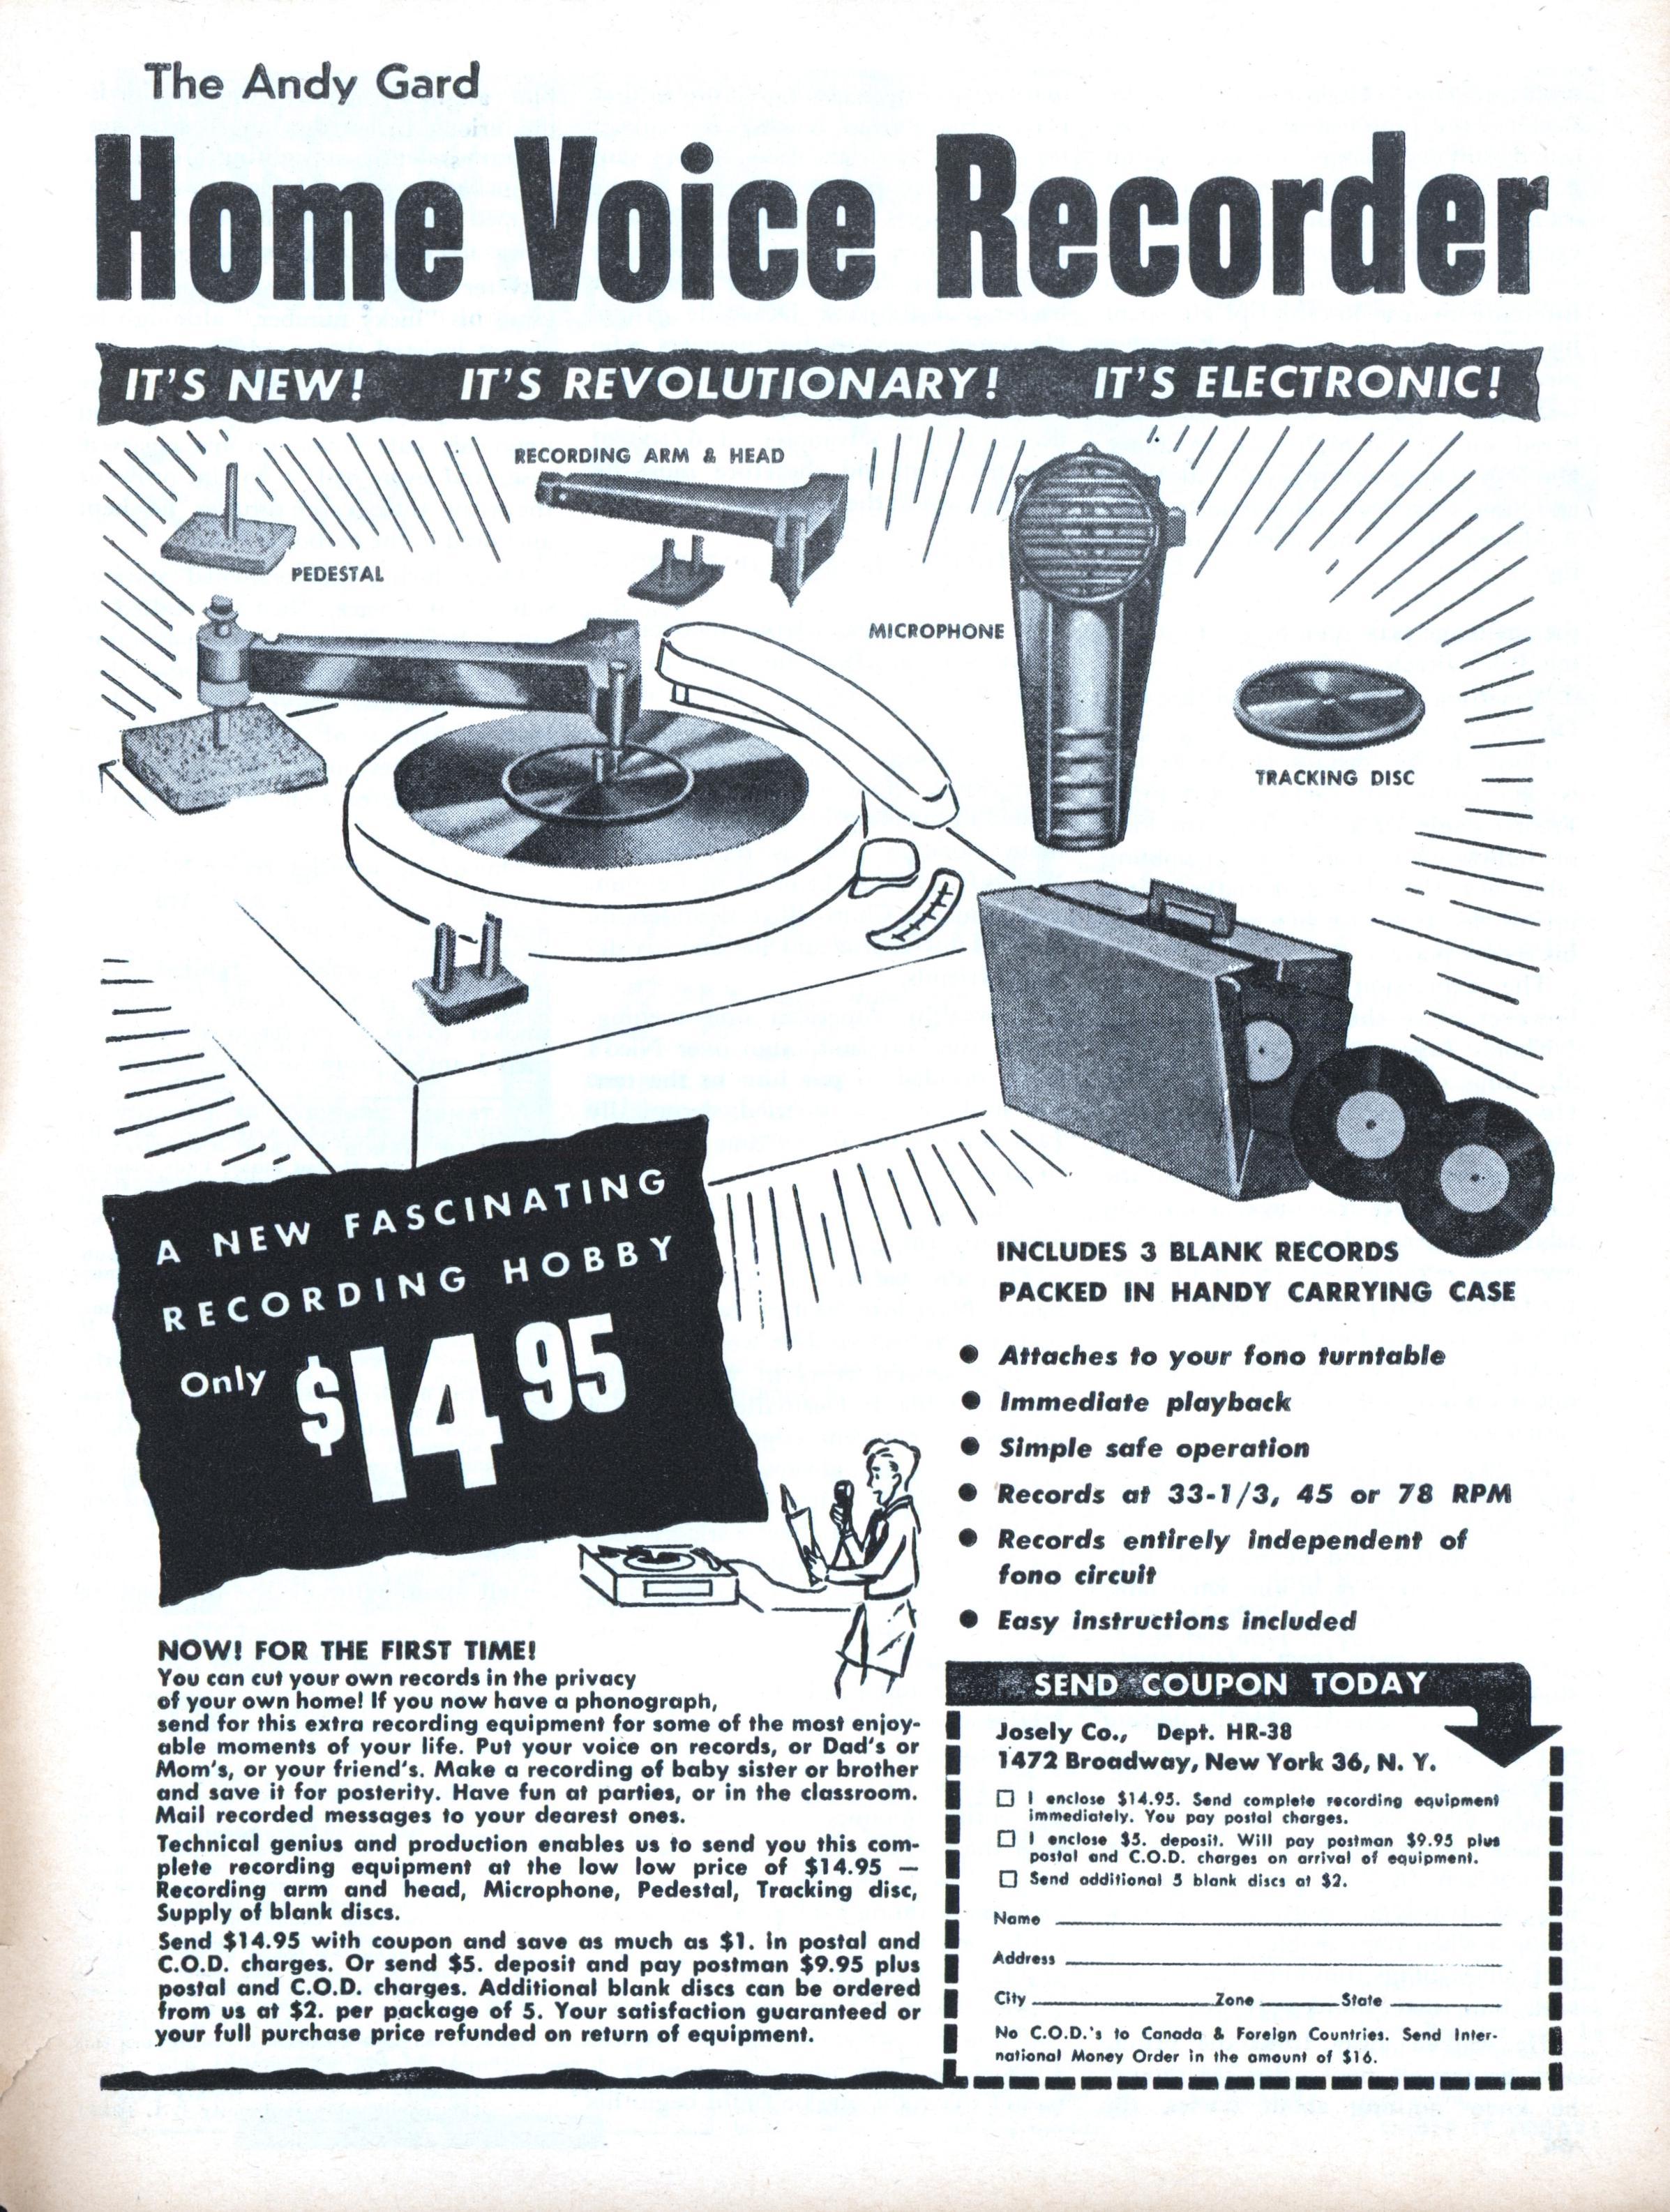 Secret voice recorder windows 7